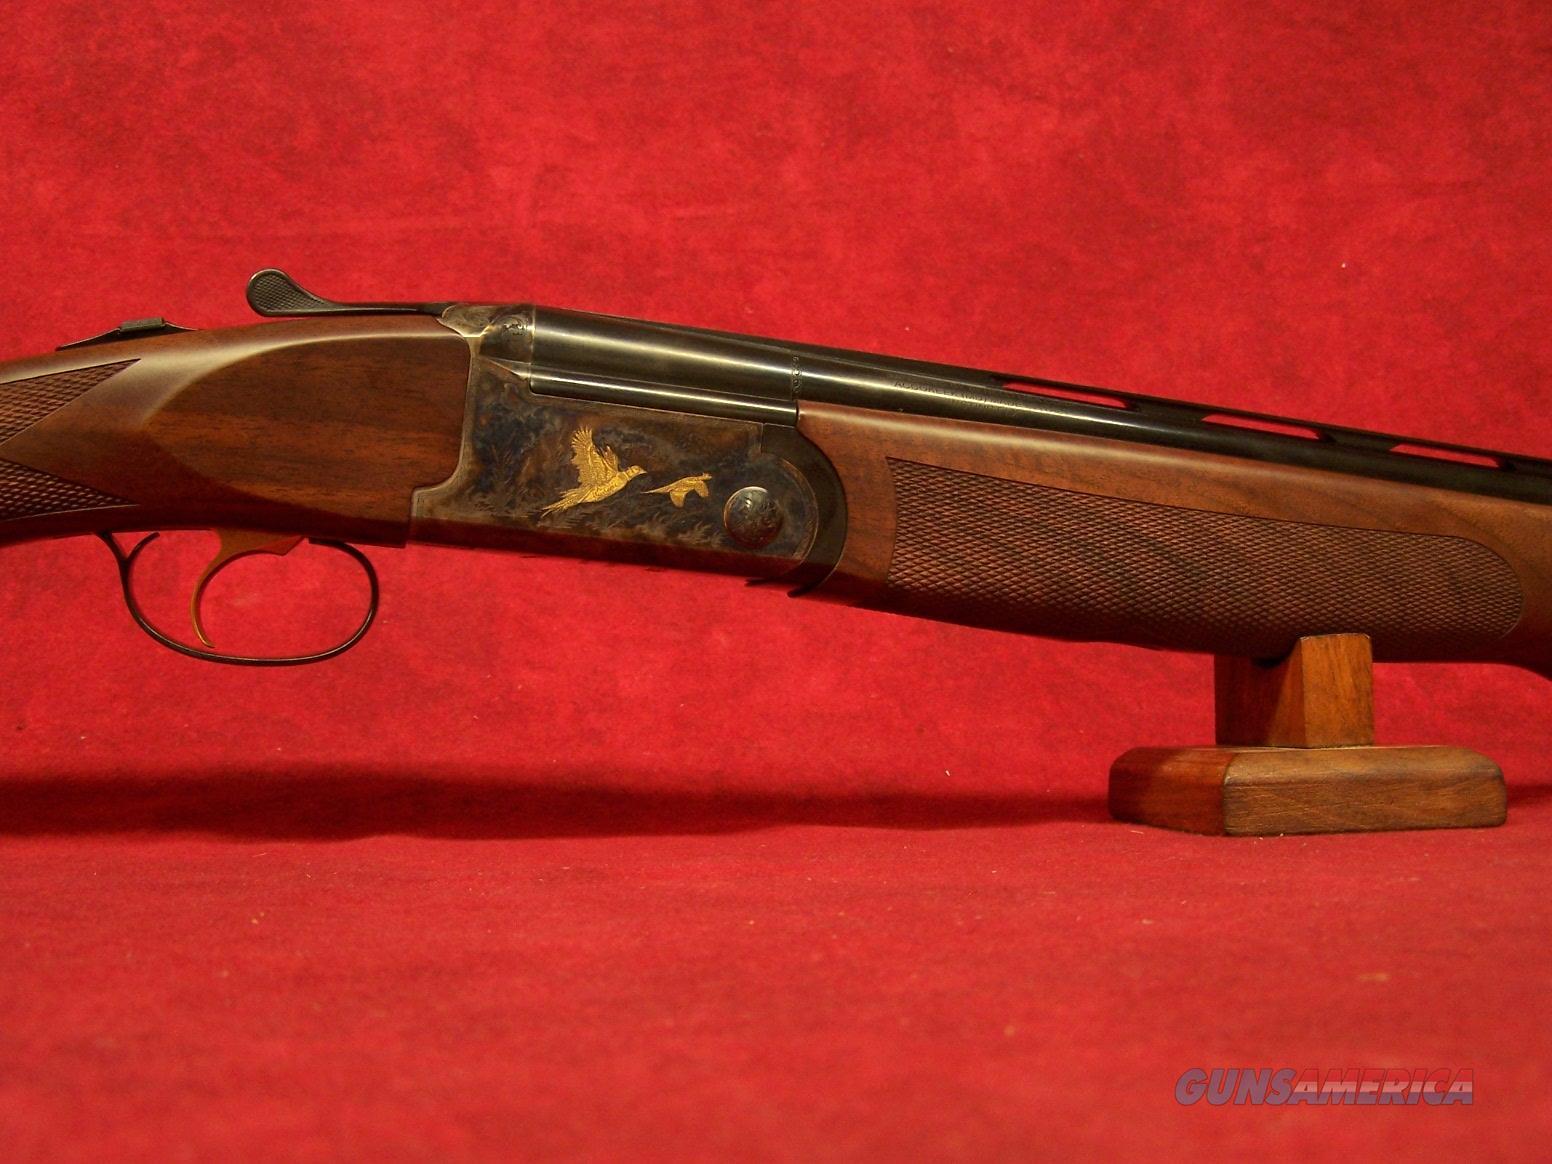 "Franchi Instinct LX 12ga 3"" 28"" Barrel (41160)  Guns > Shotguns > Franchi Shotguns > Over/Under > Hunting"